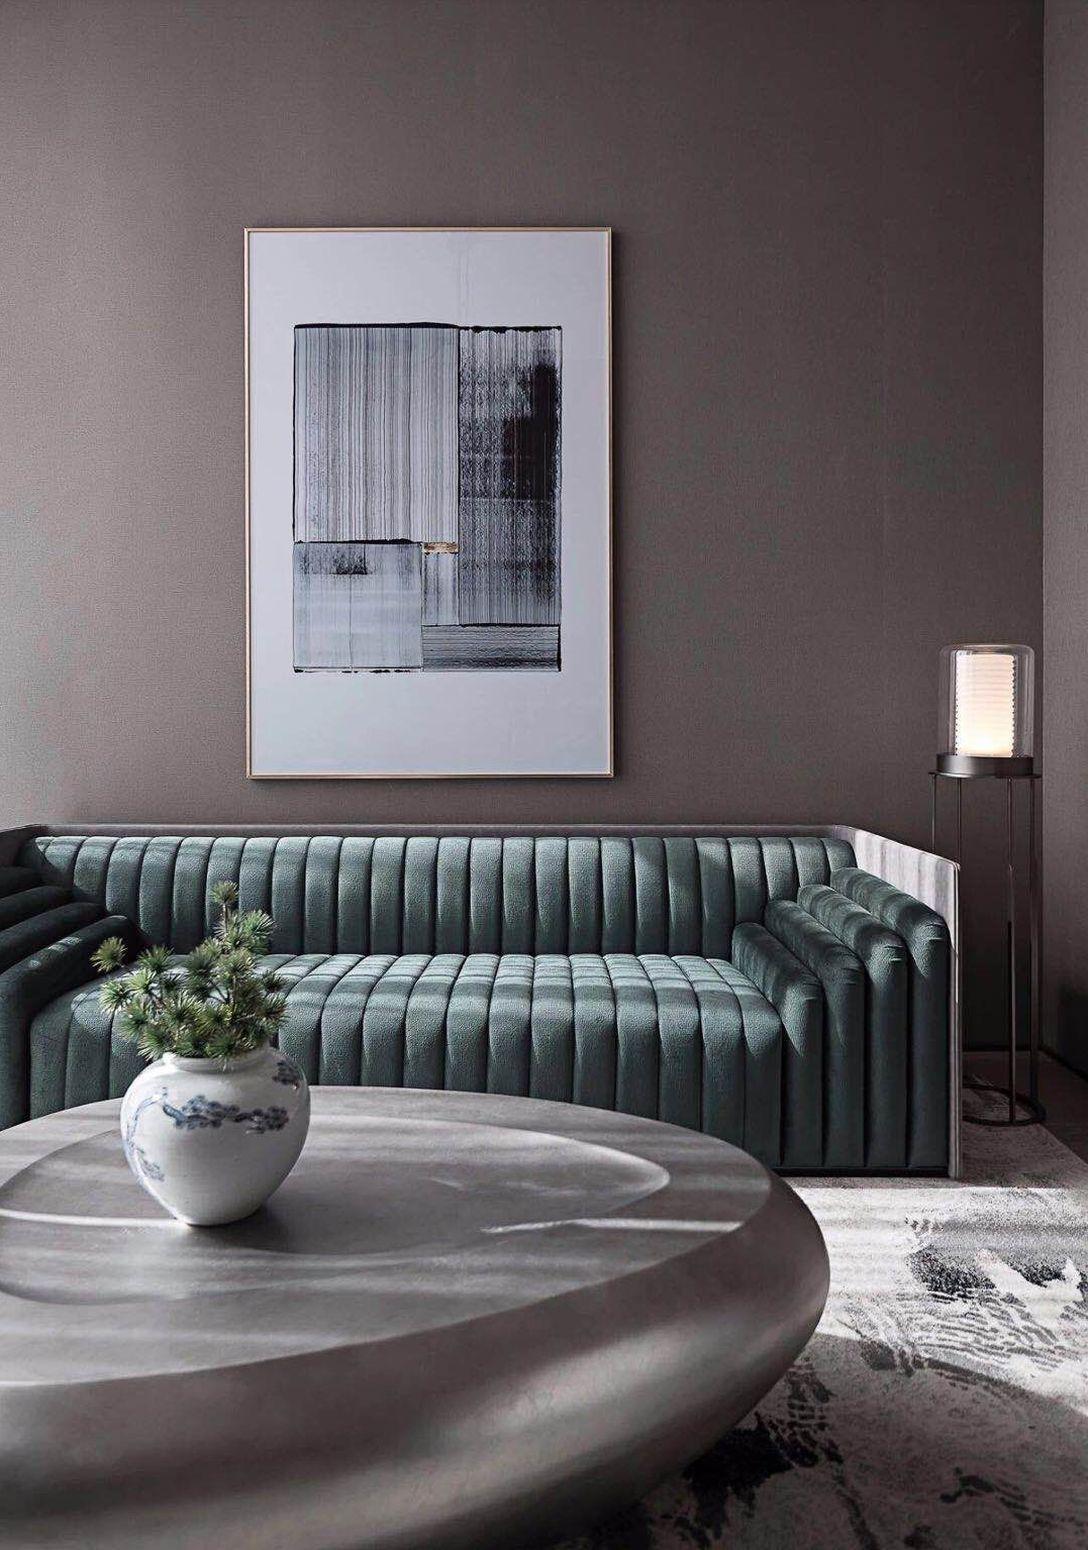 8 Best Creative And Unique Sofa Designs In 2020 Sofa Design Couch Design Beautiful Sofas